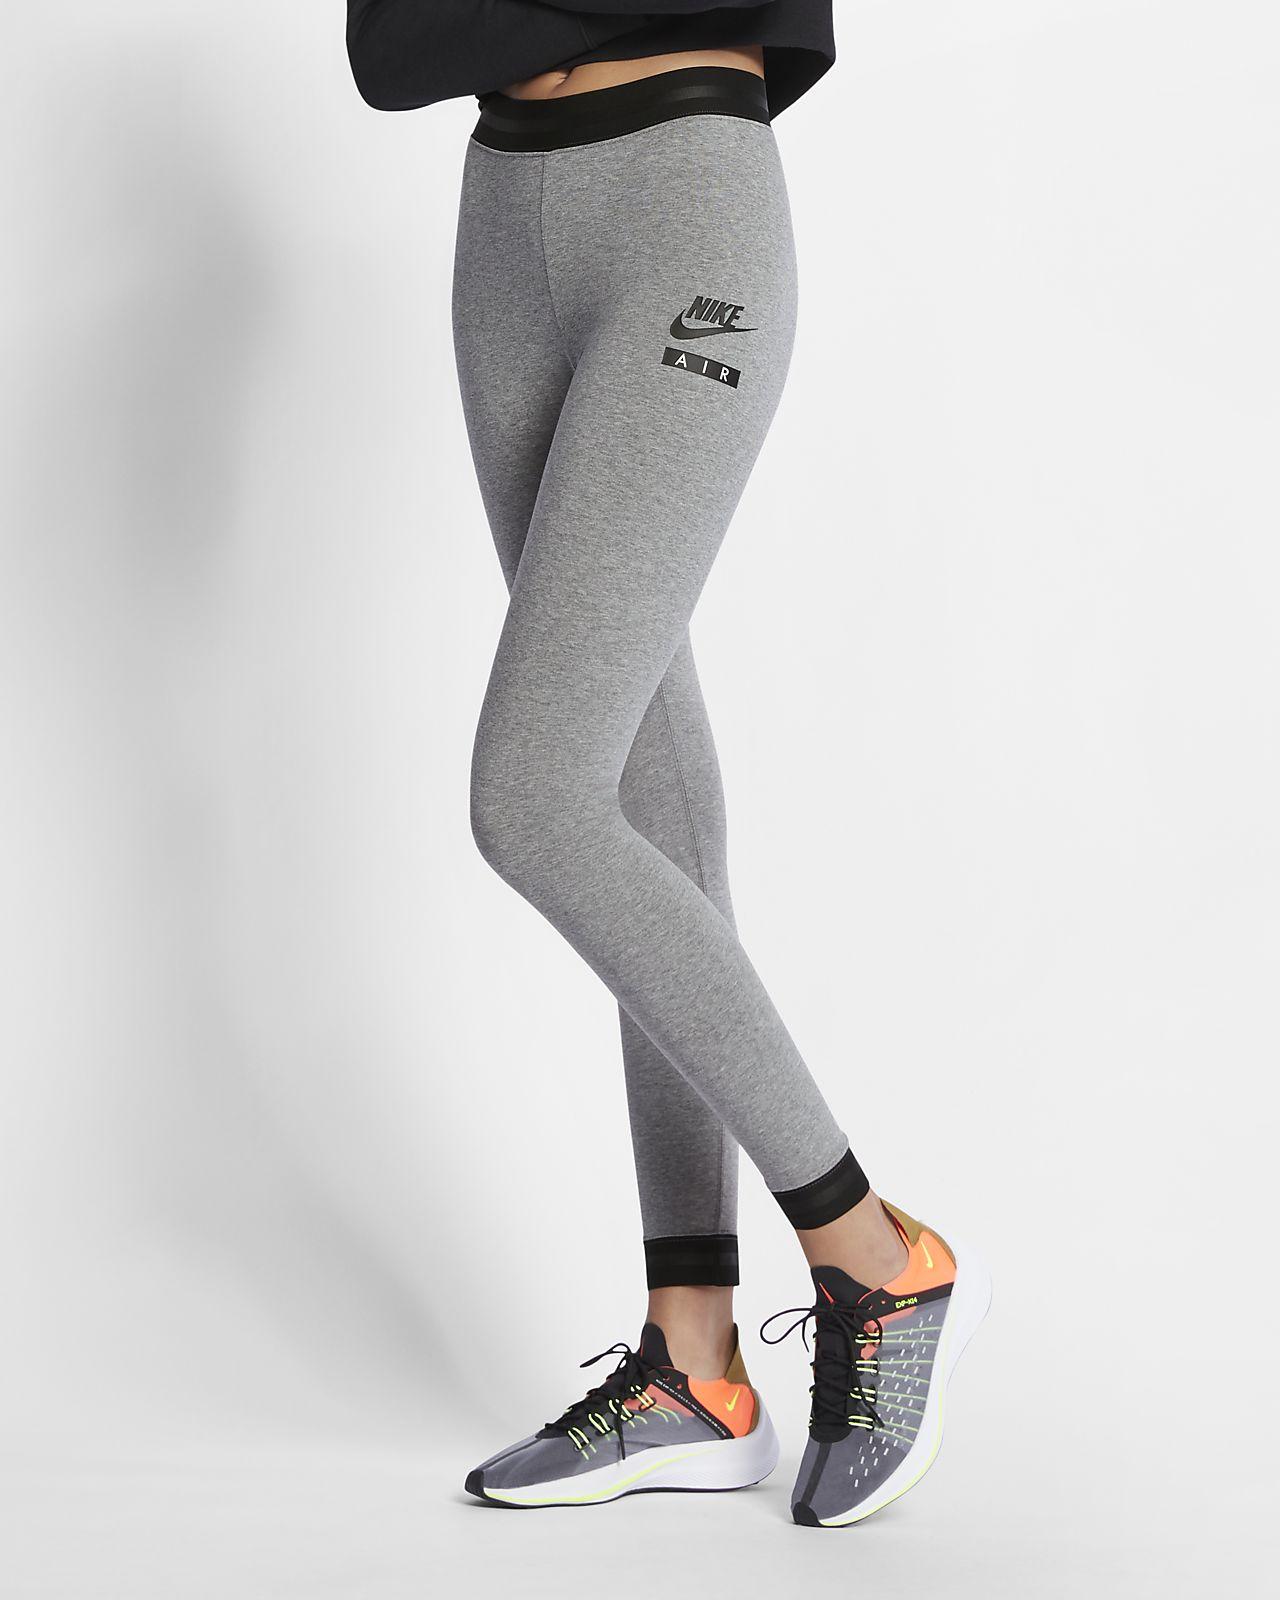 leggings donna nike cotone